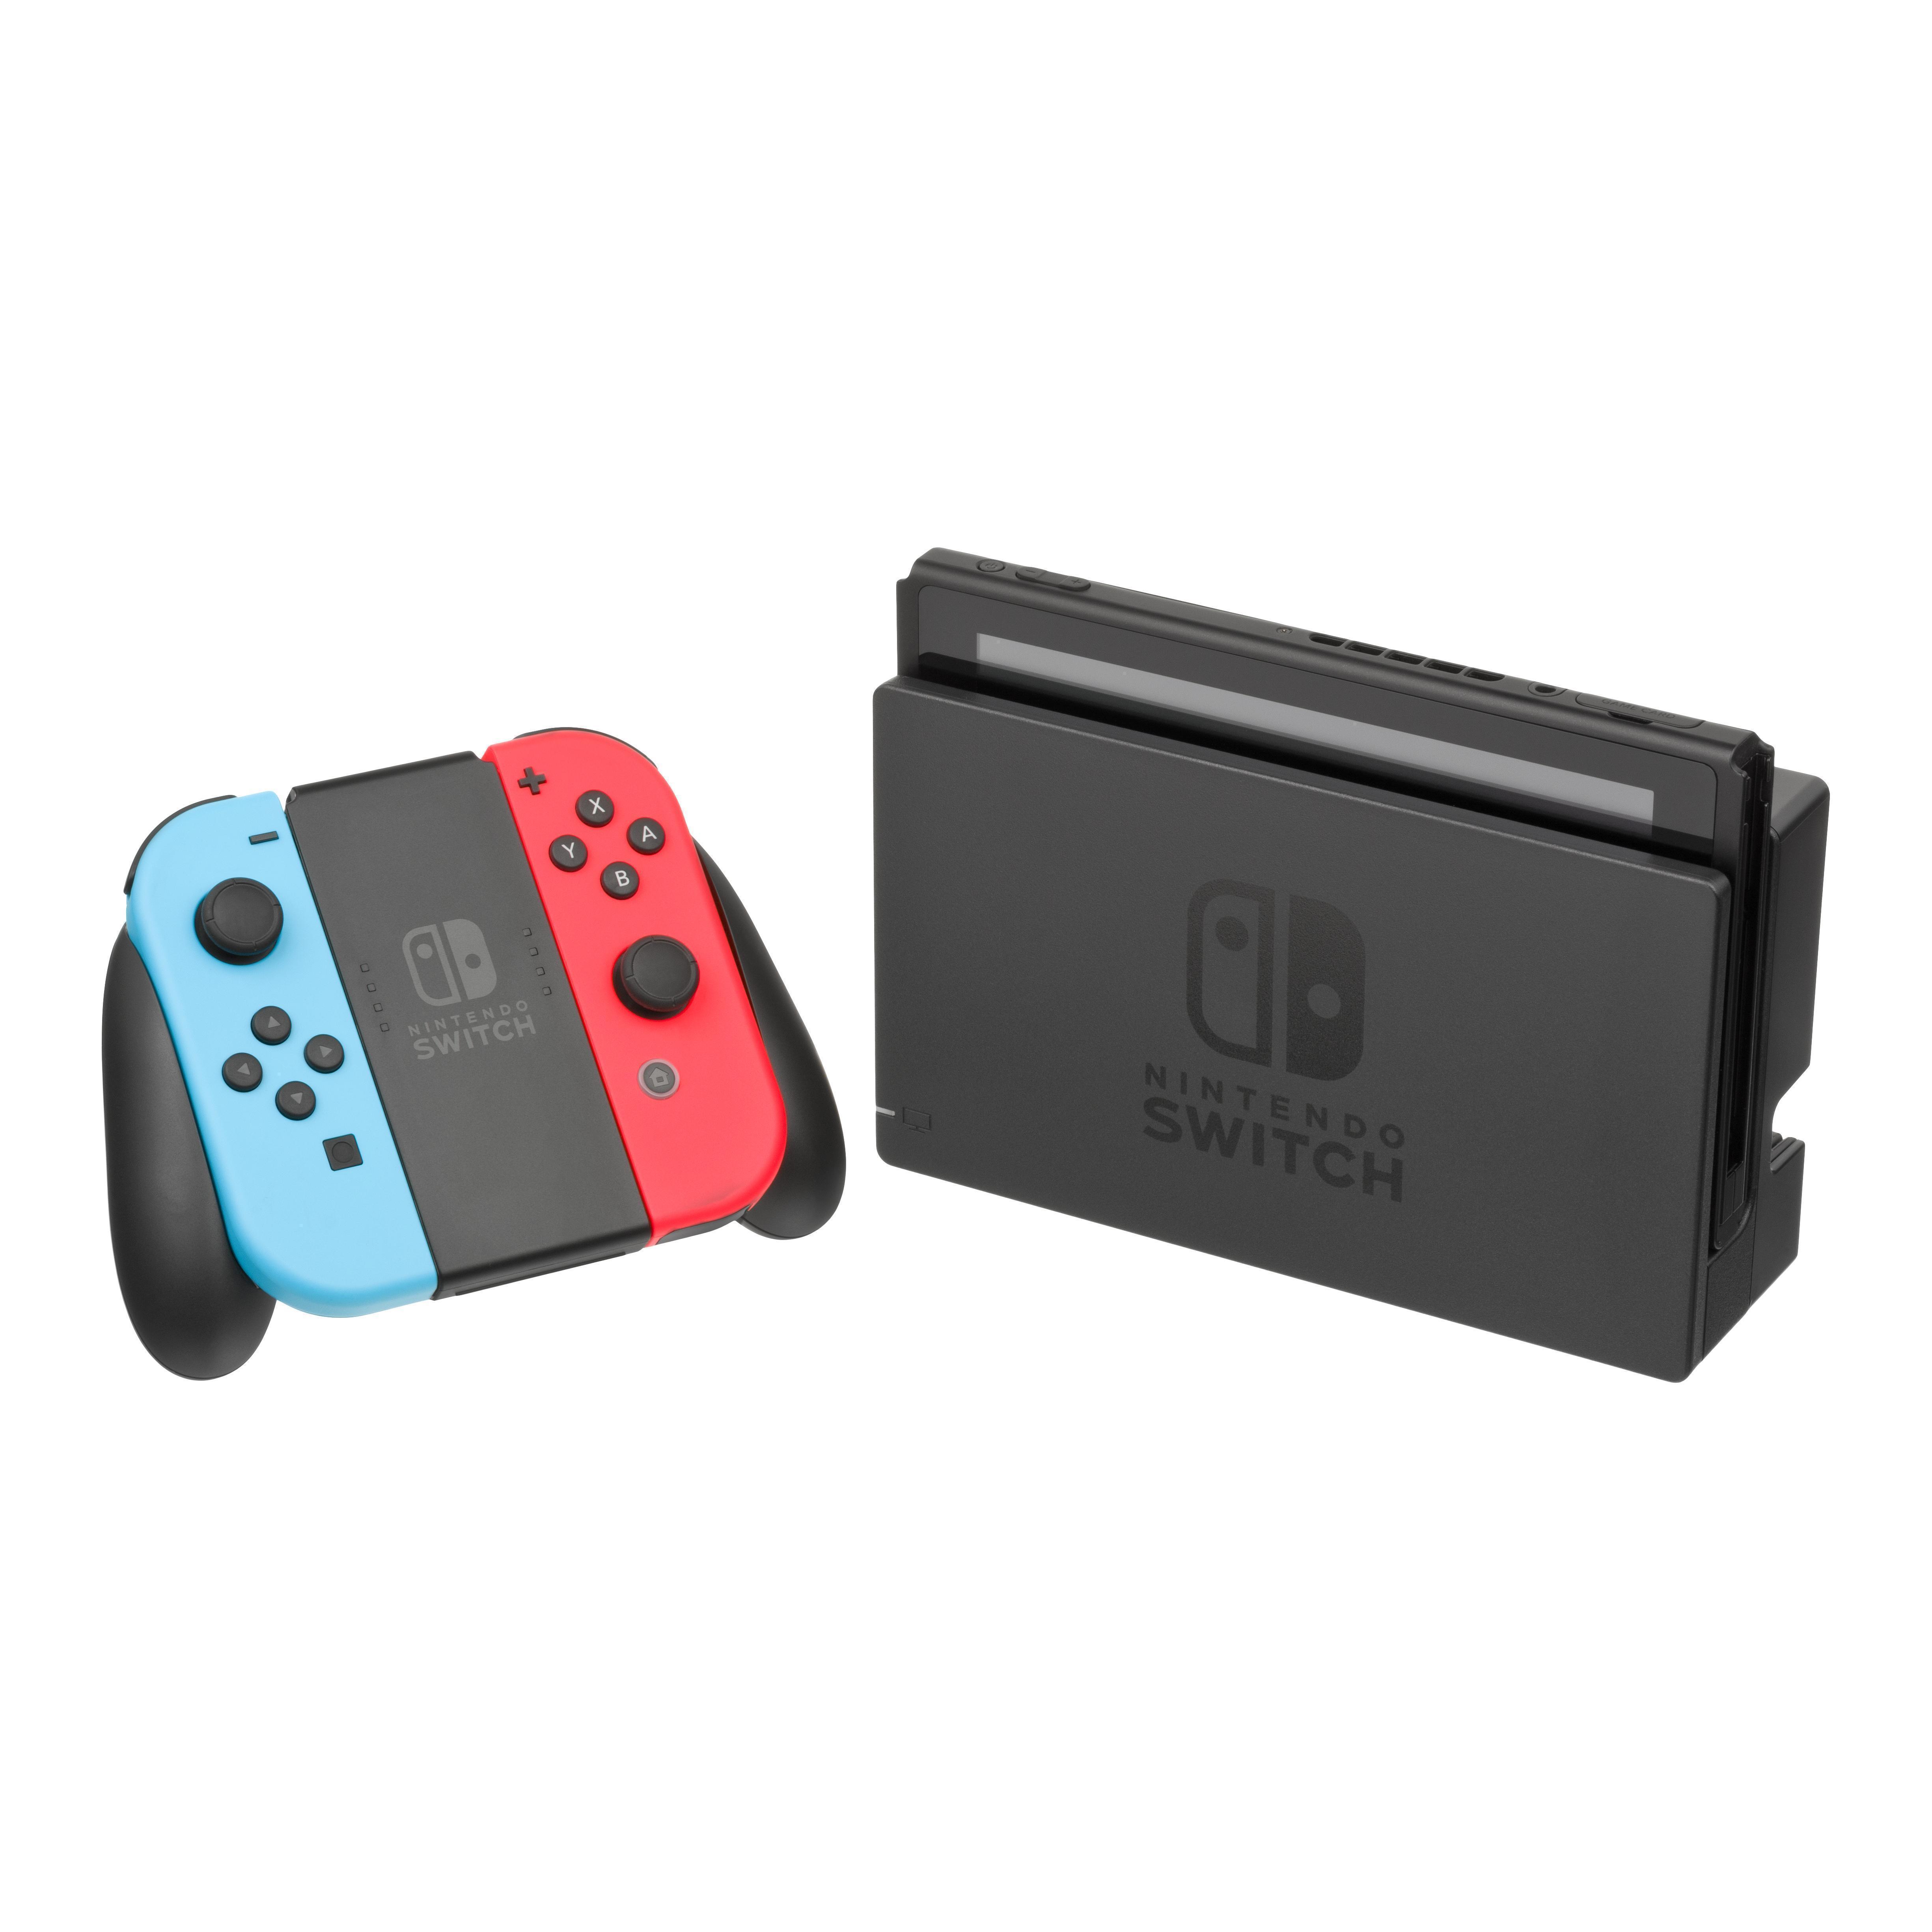 Console Nintendo Switch Mario Kart Deluxe 32 Go - Gris